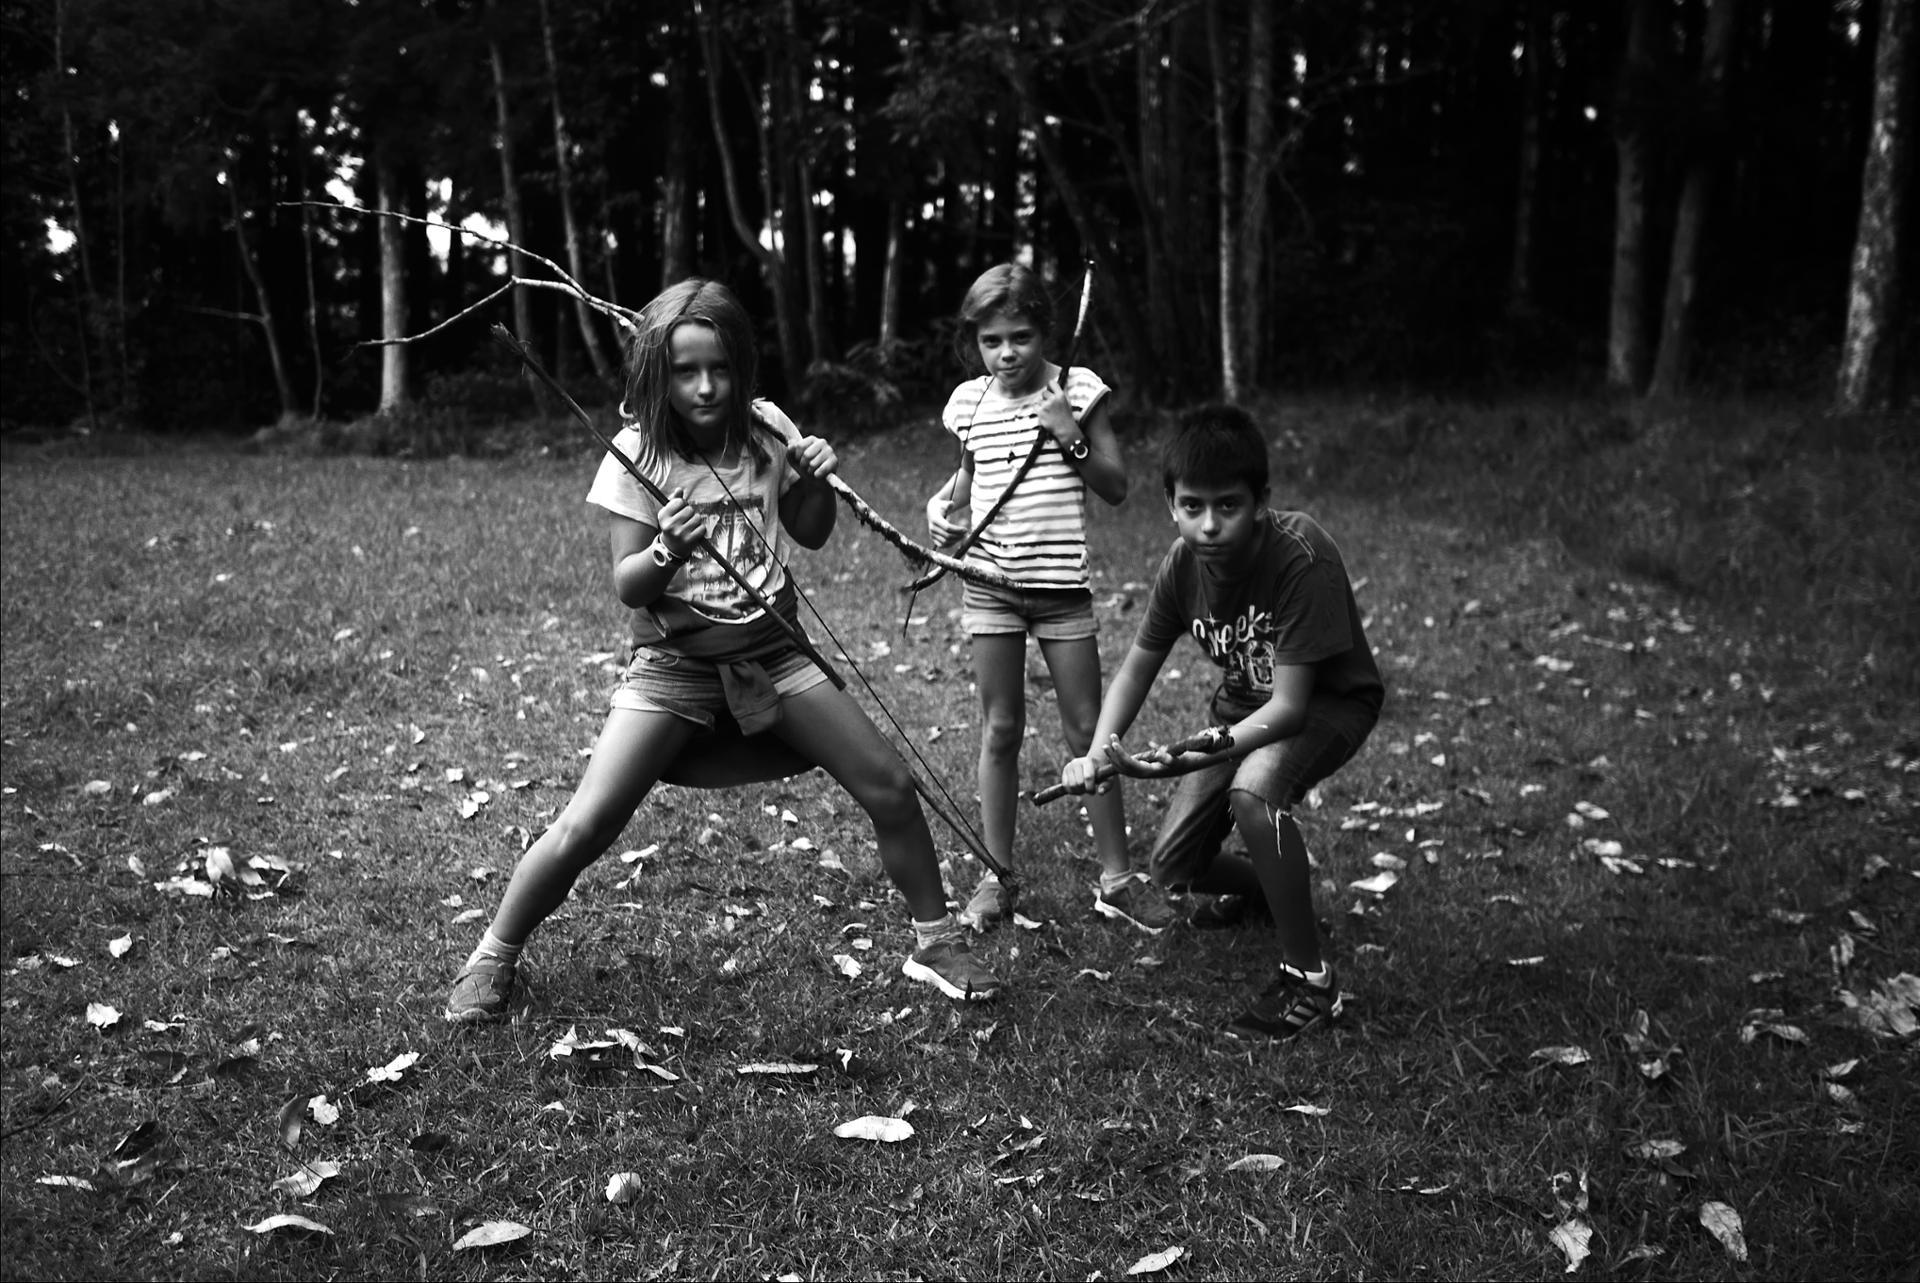 guerriers en herbe et forêt